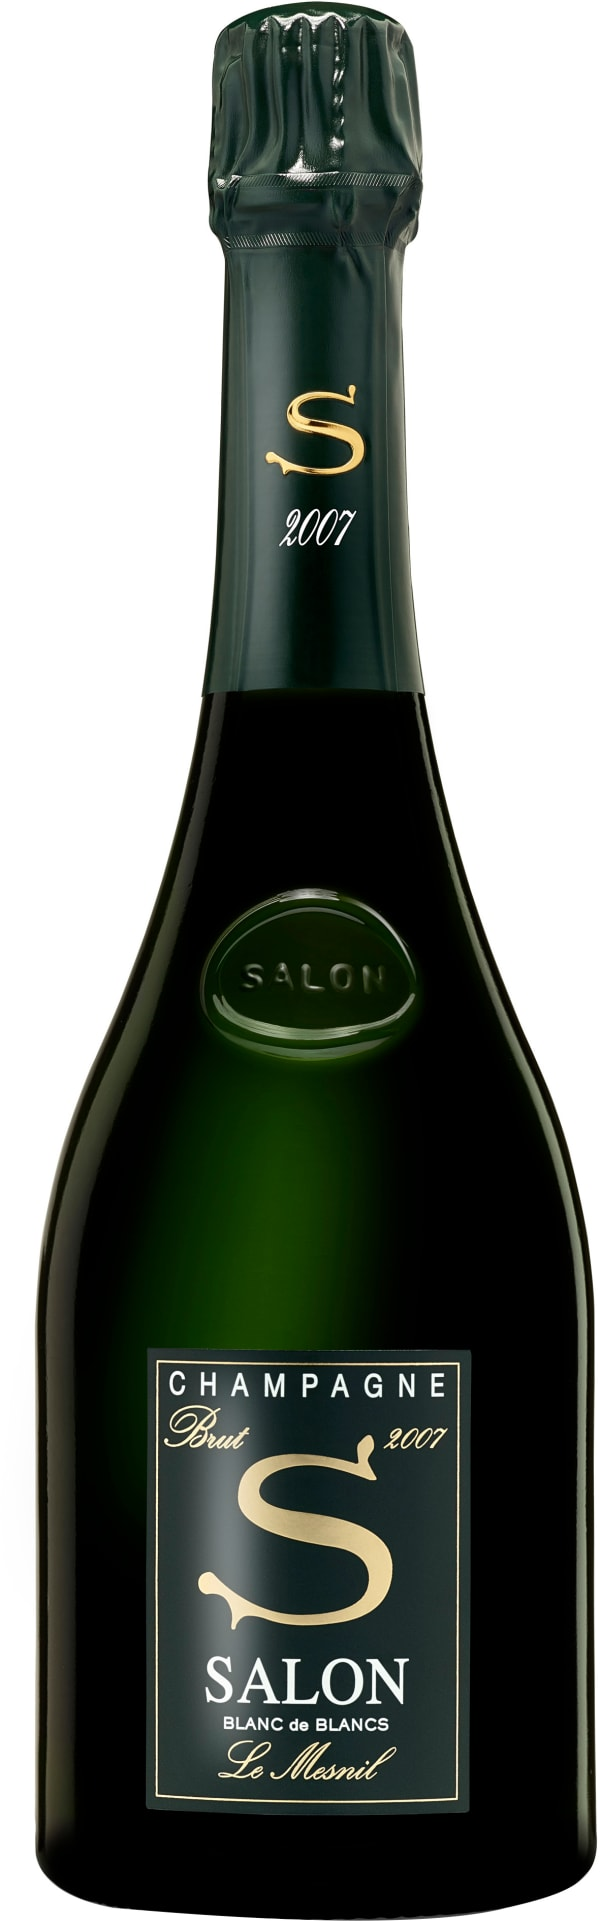 Salon Le Mesnil Blanc de Blancs Champagne Brut  2007